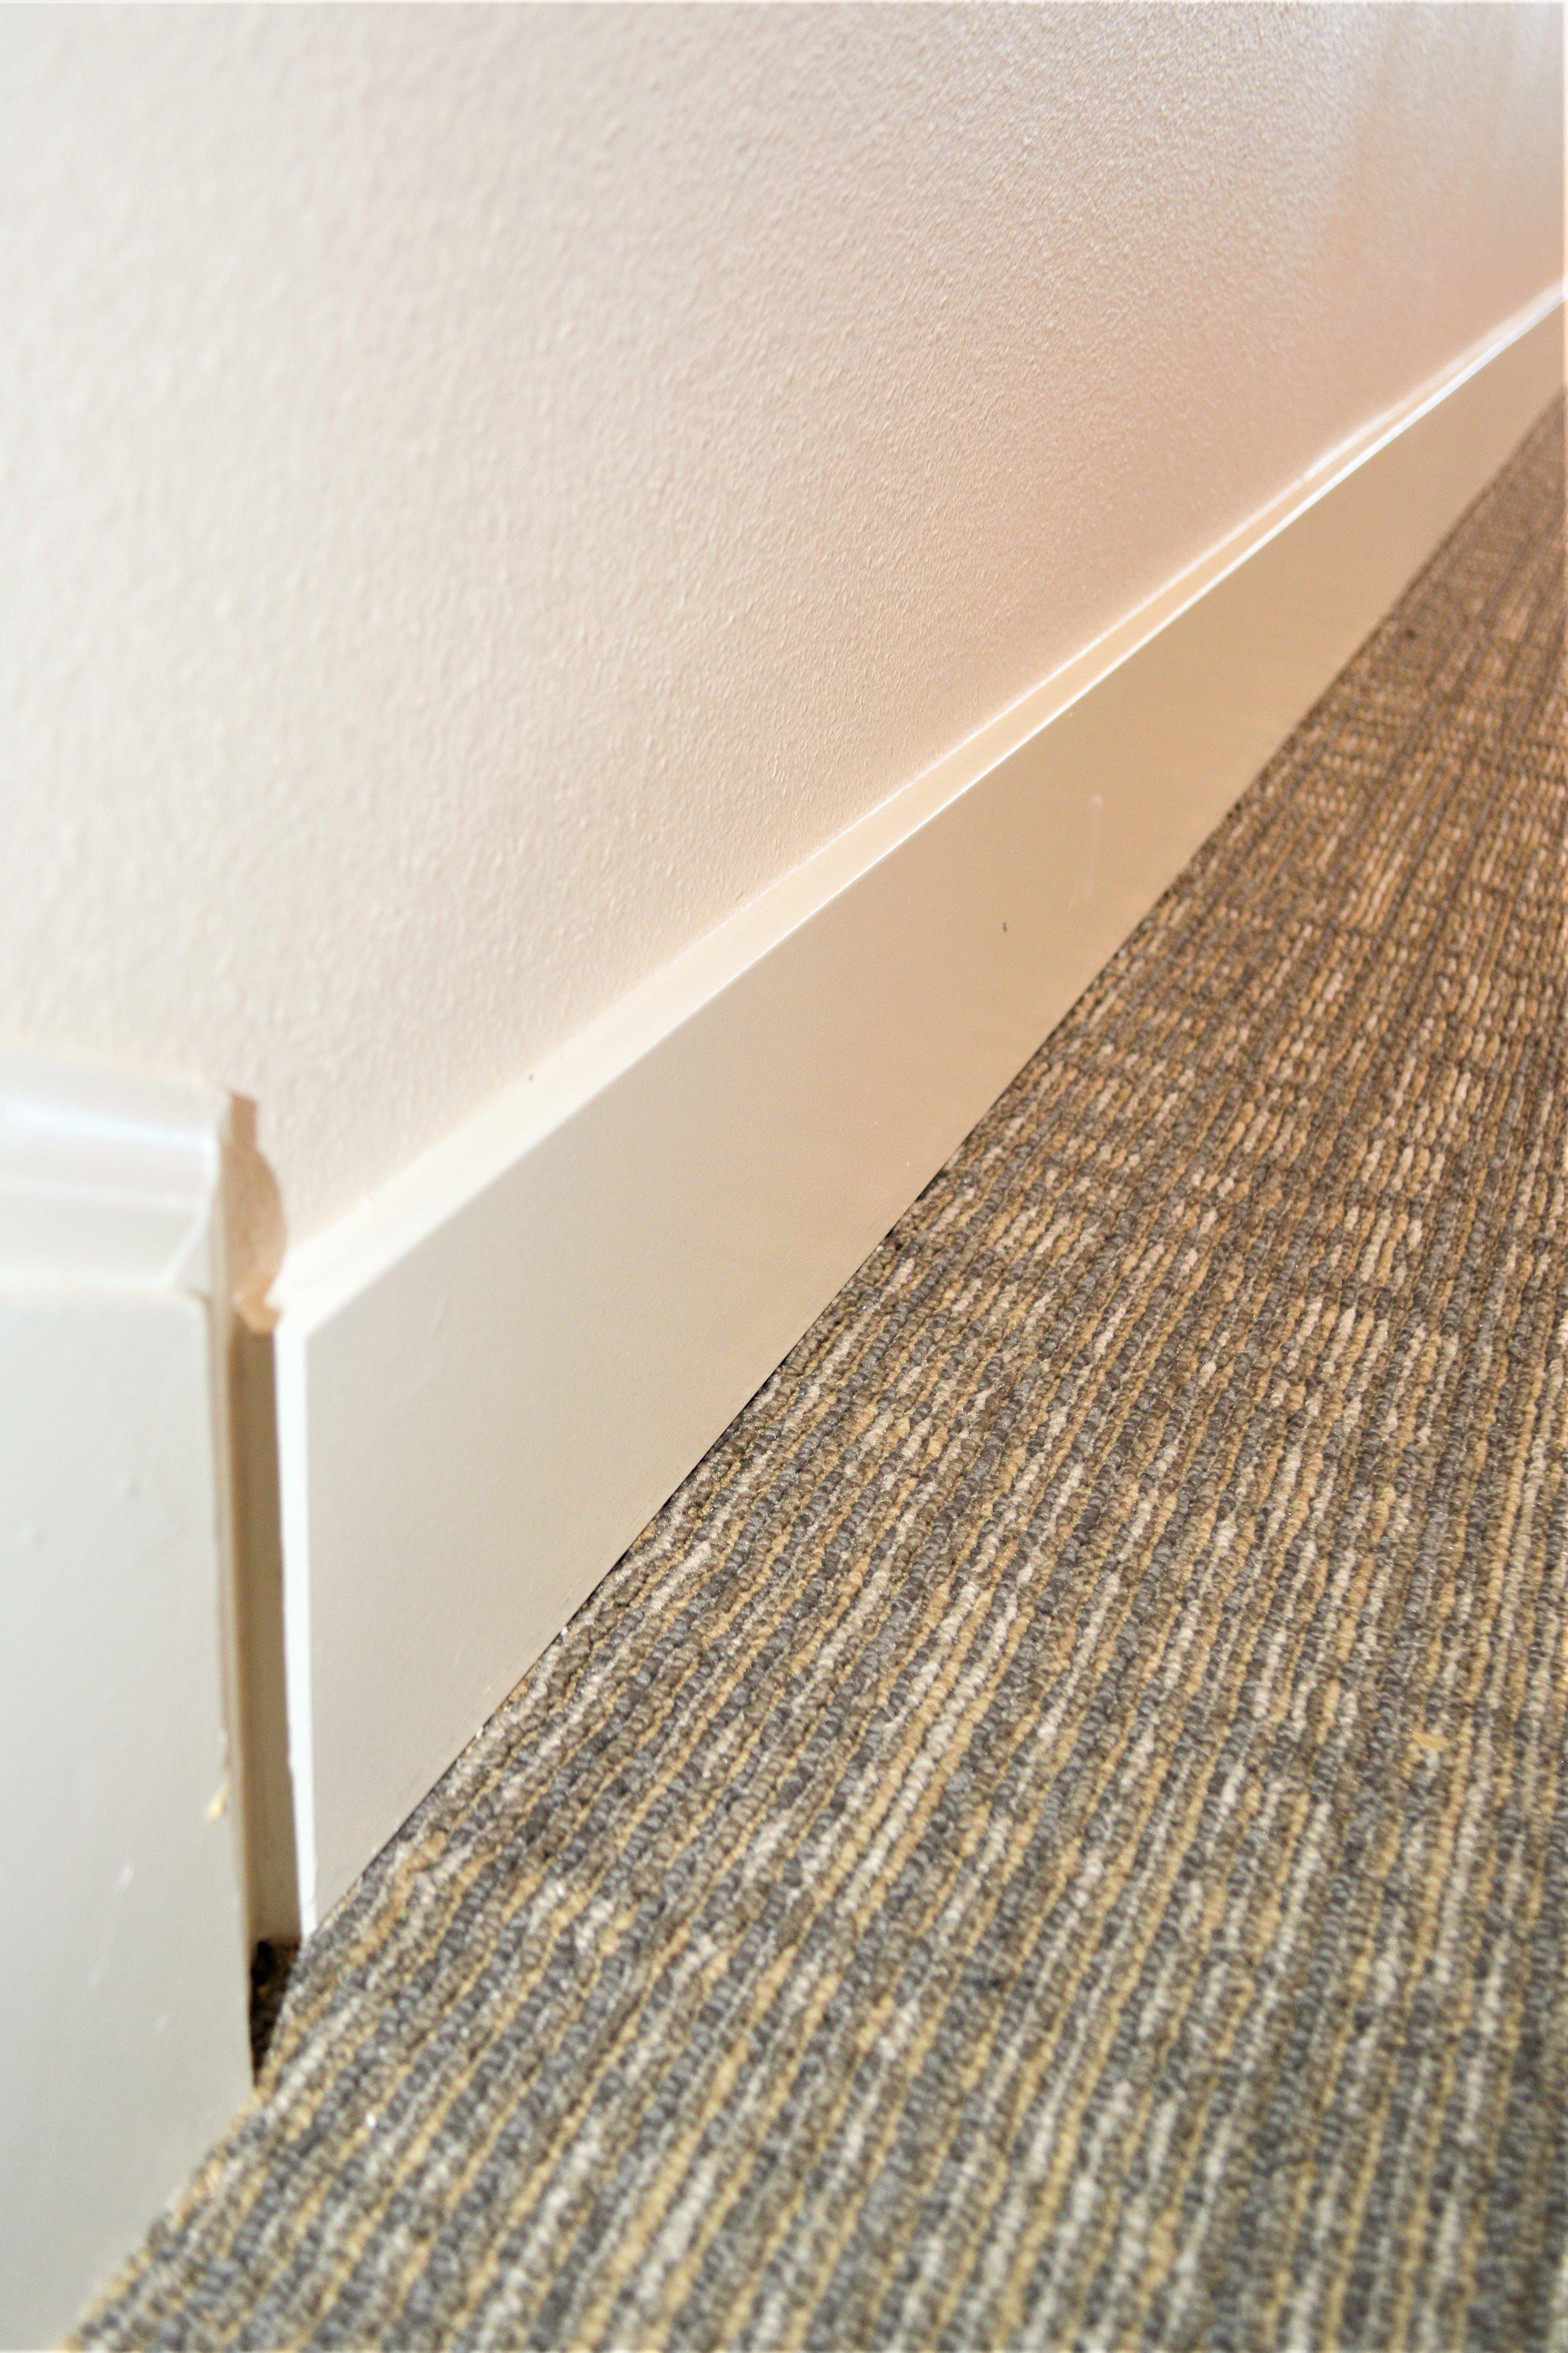 stair skirt and base board .JPG